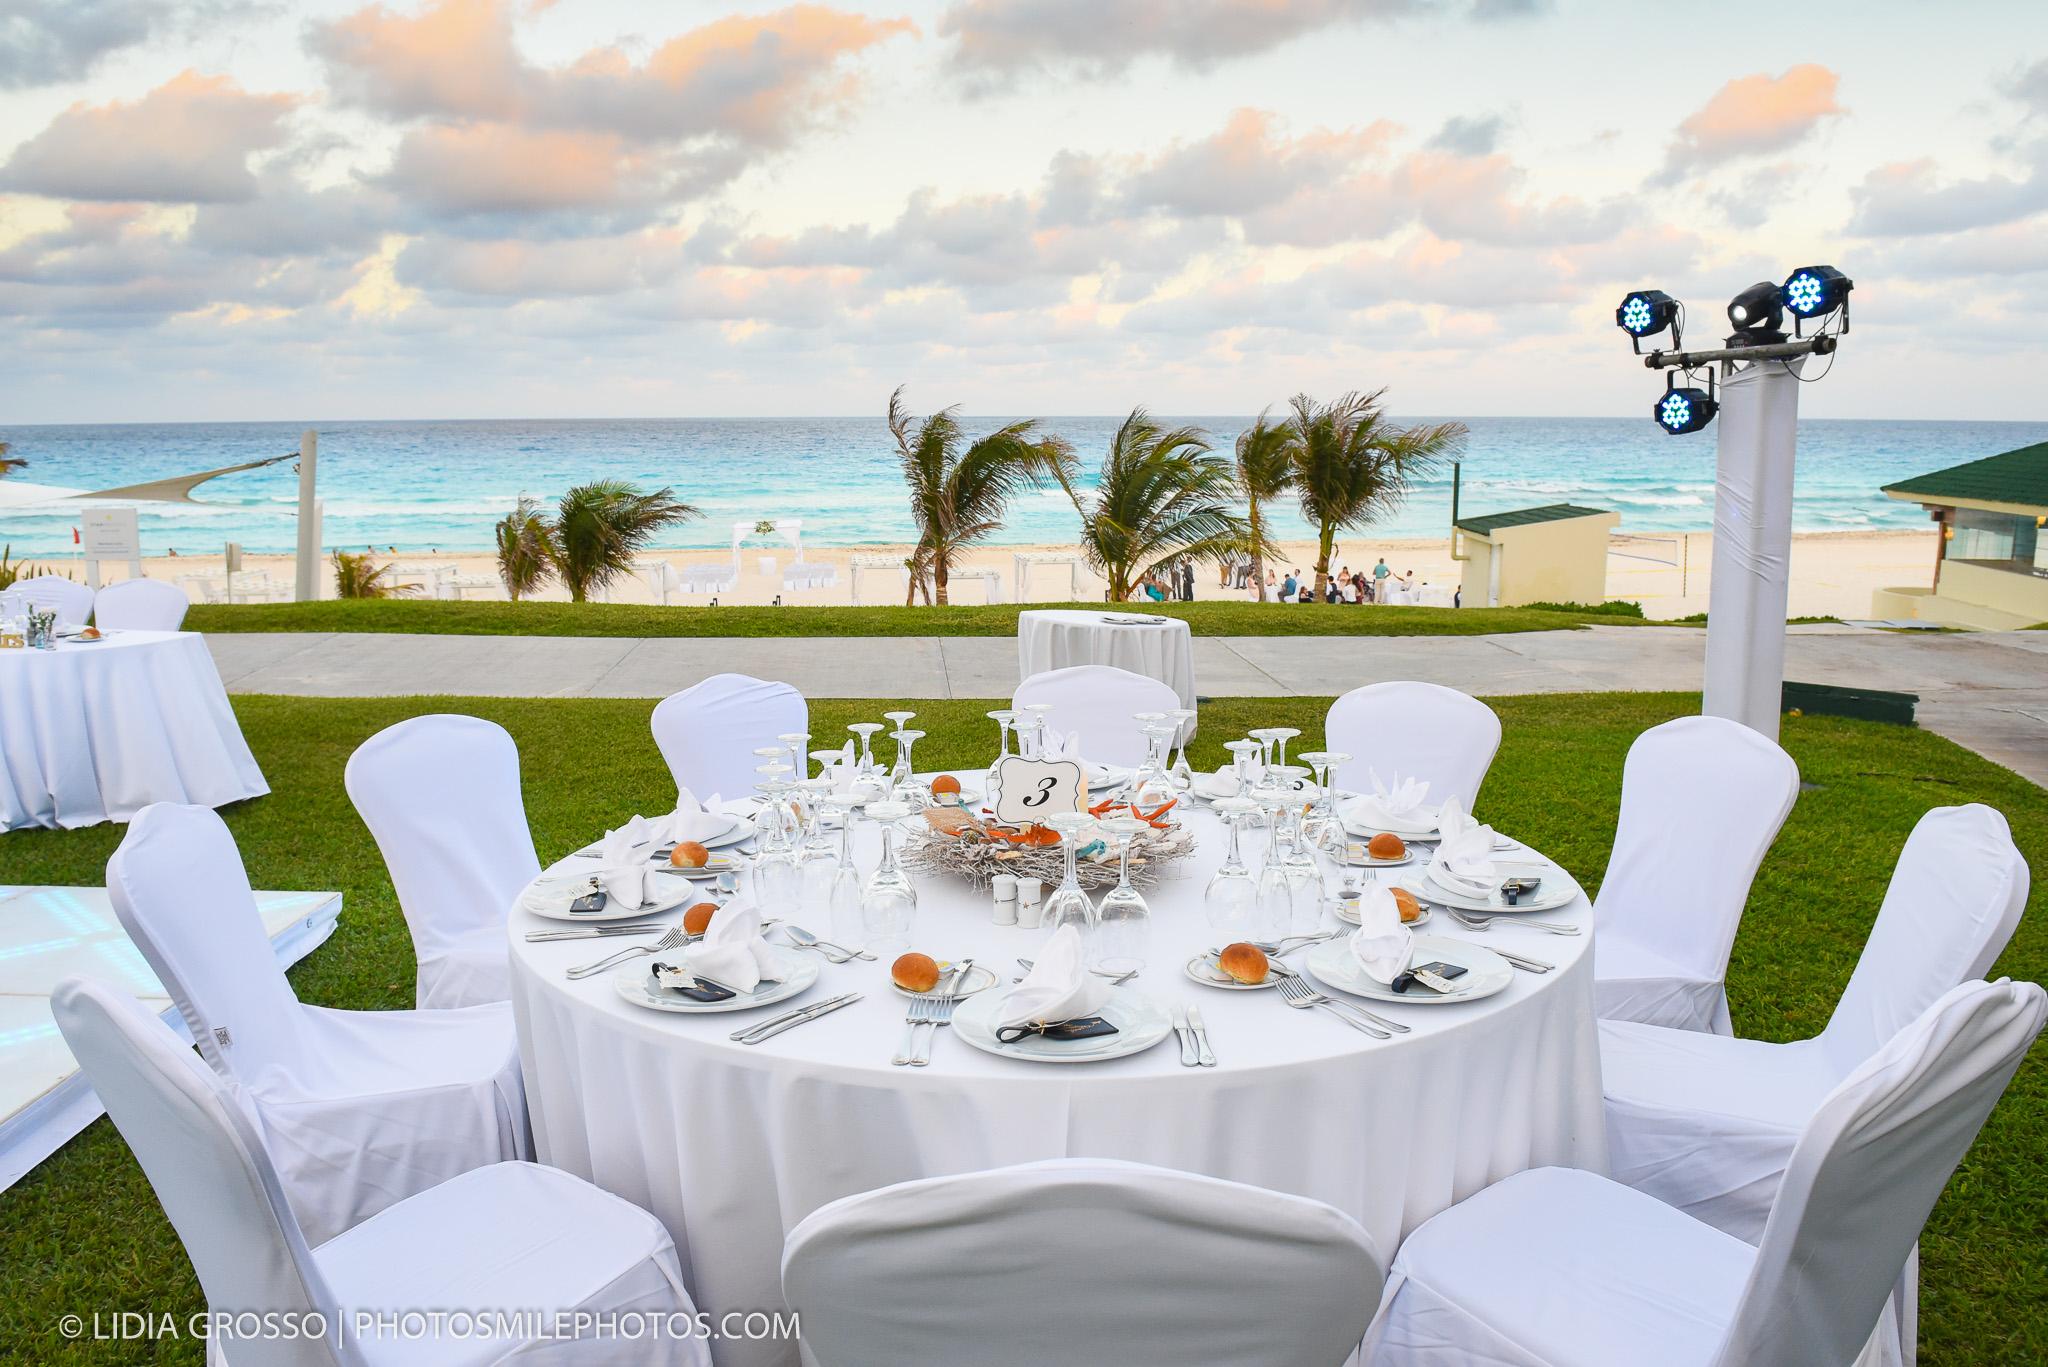 Location Iberostar Cancun